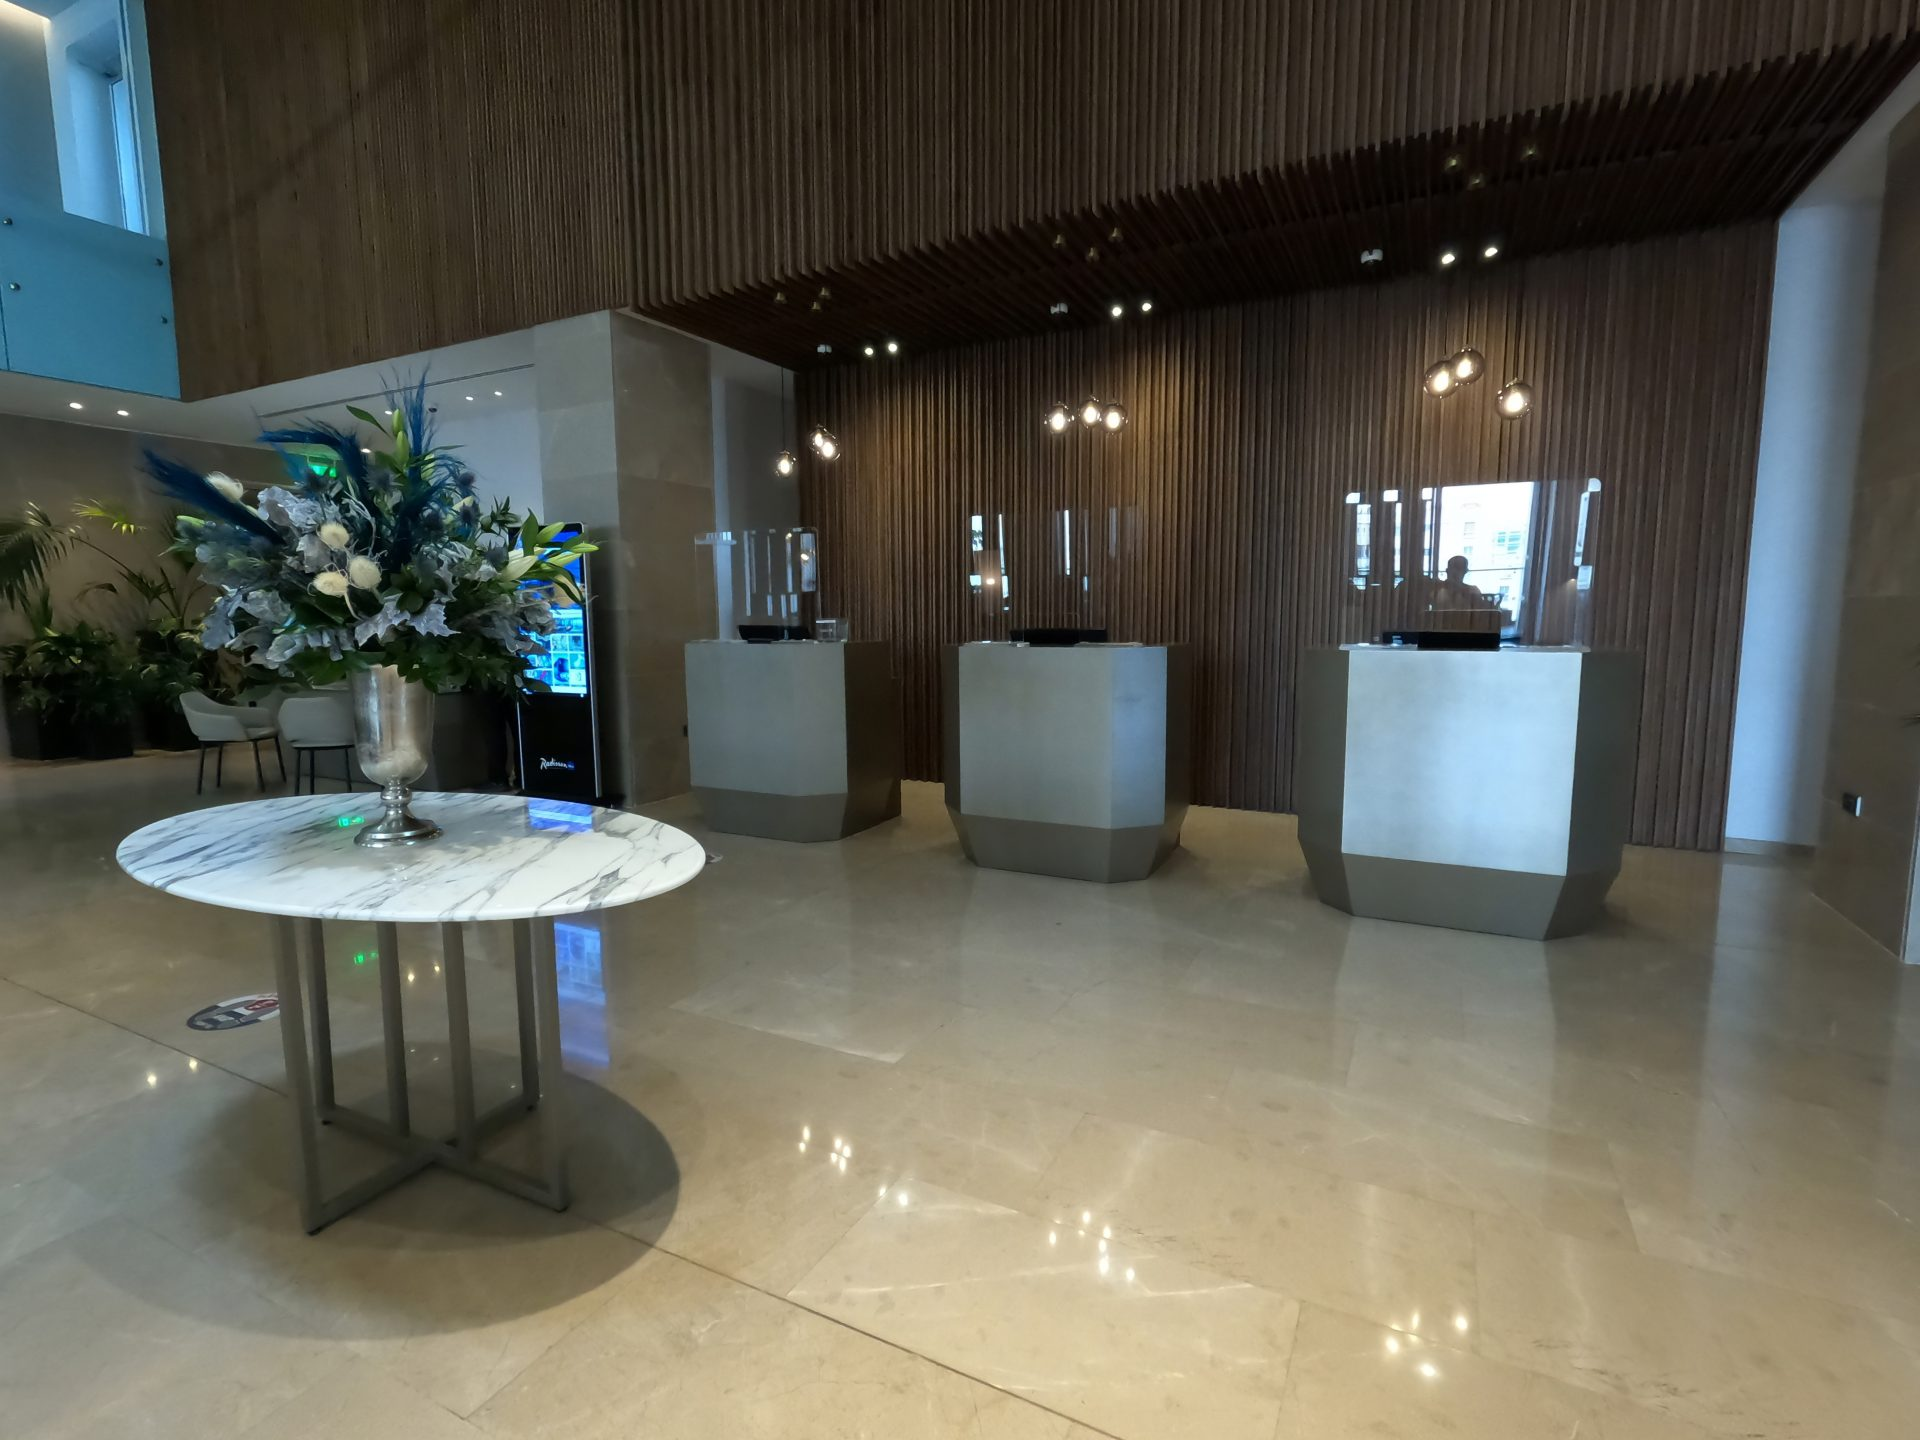 Radisson Blu Hotel, Larnaca Review - Reception Area